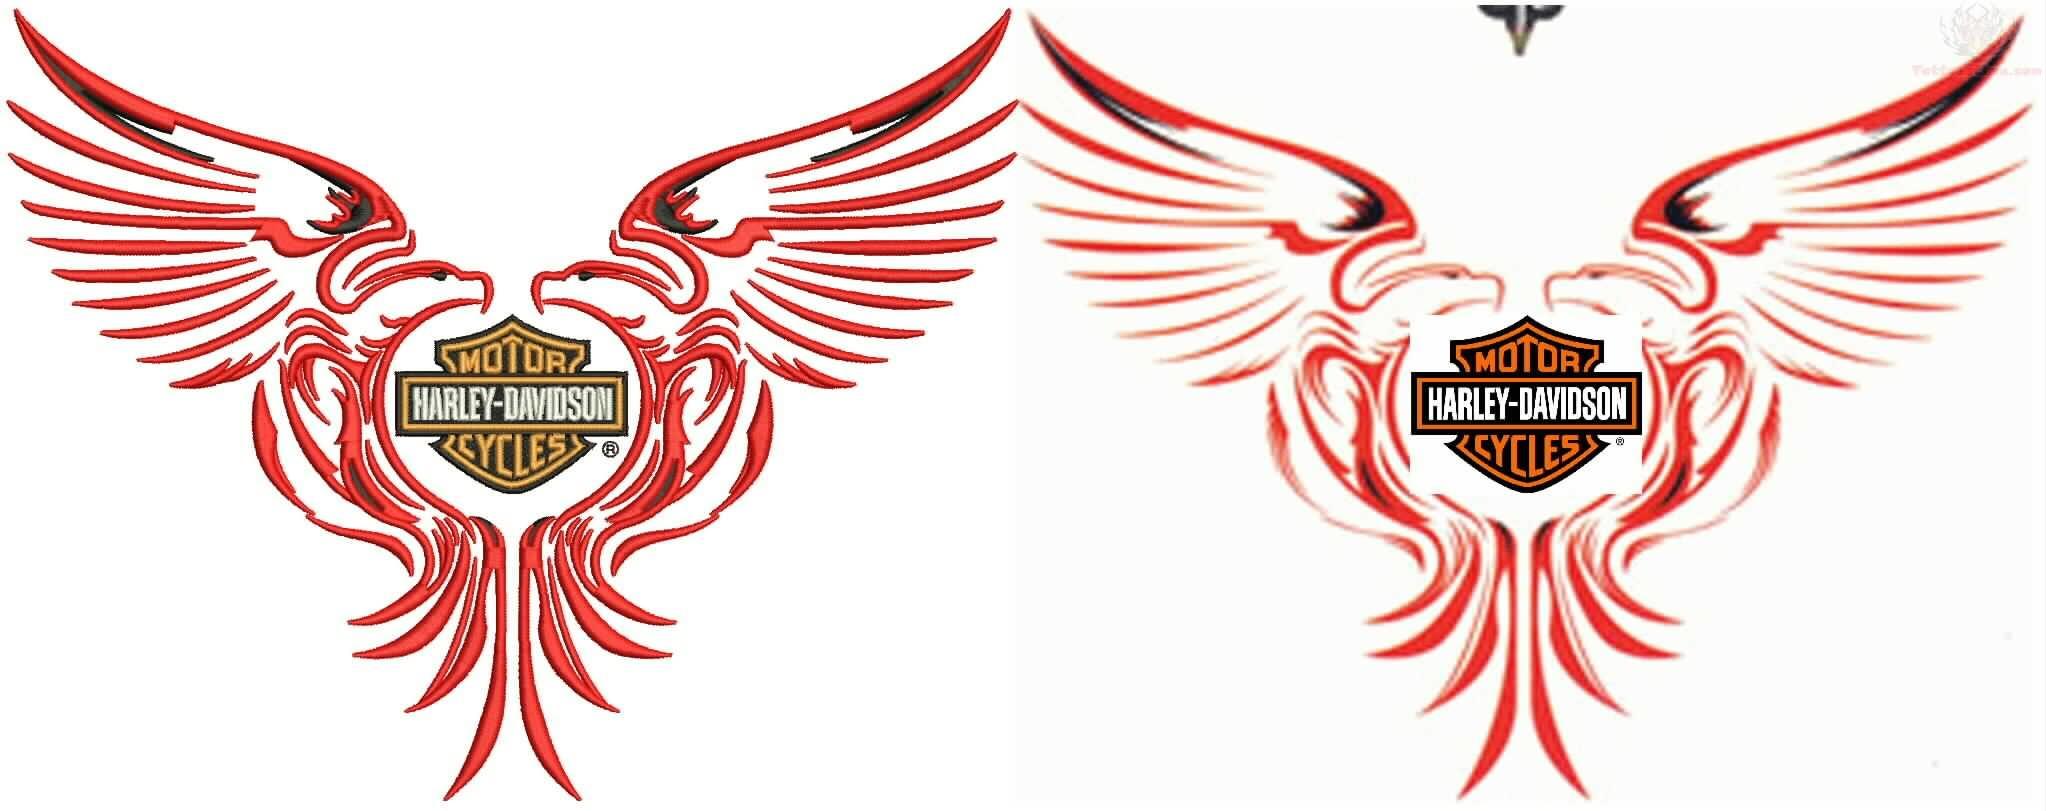 Harley Davidson Embroidery Design  2017 2018 Best Cars